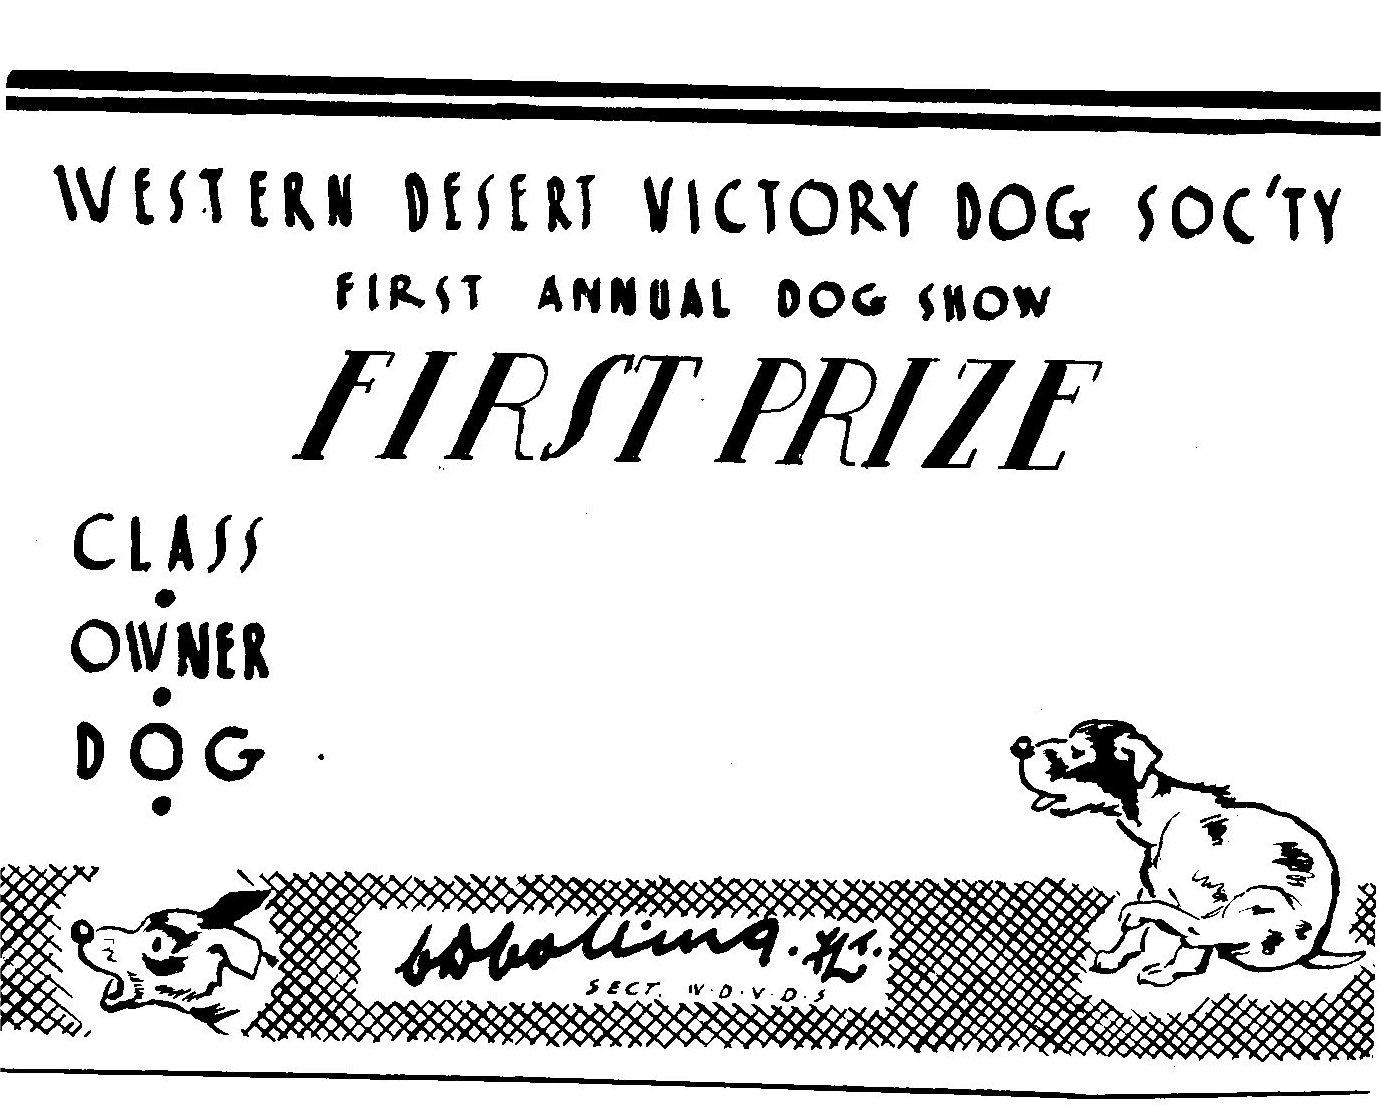 Desert Victory Dog Socty